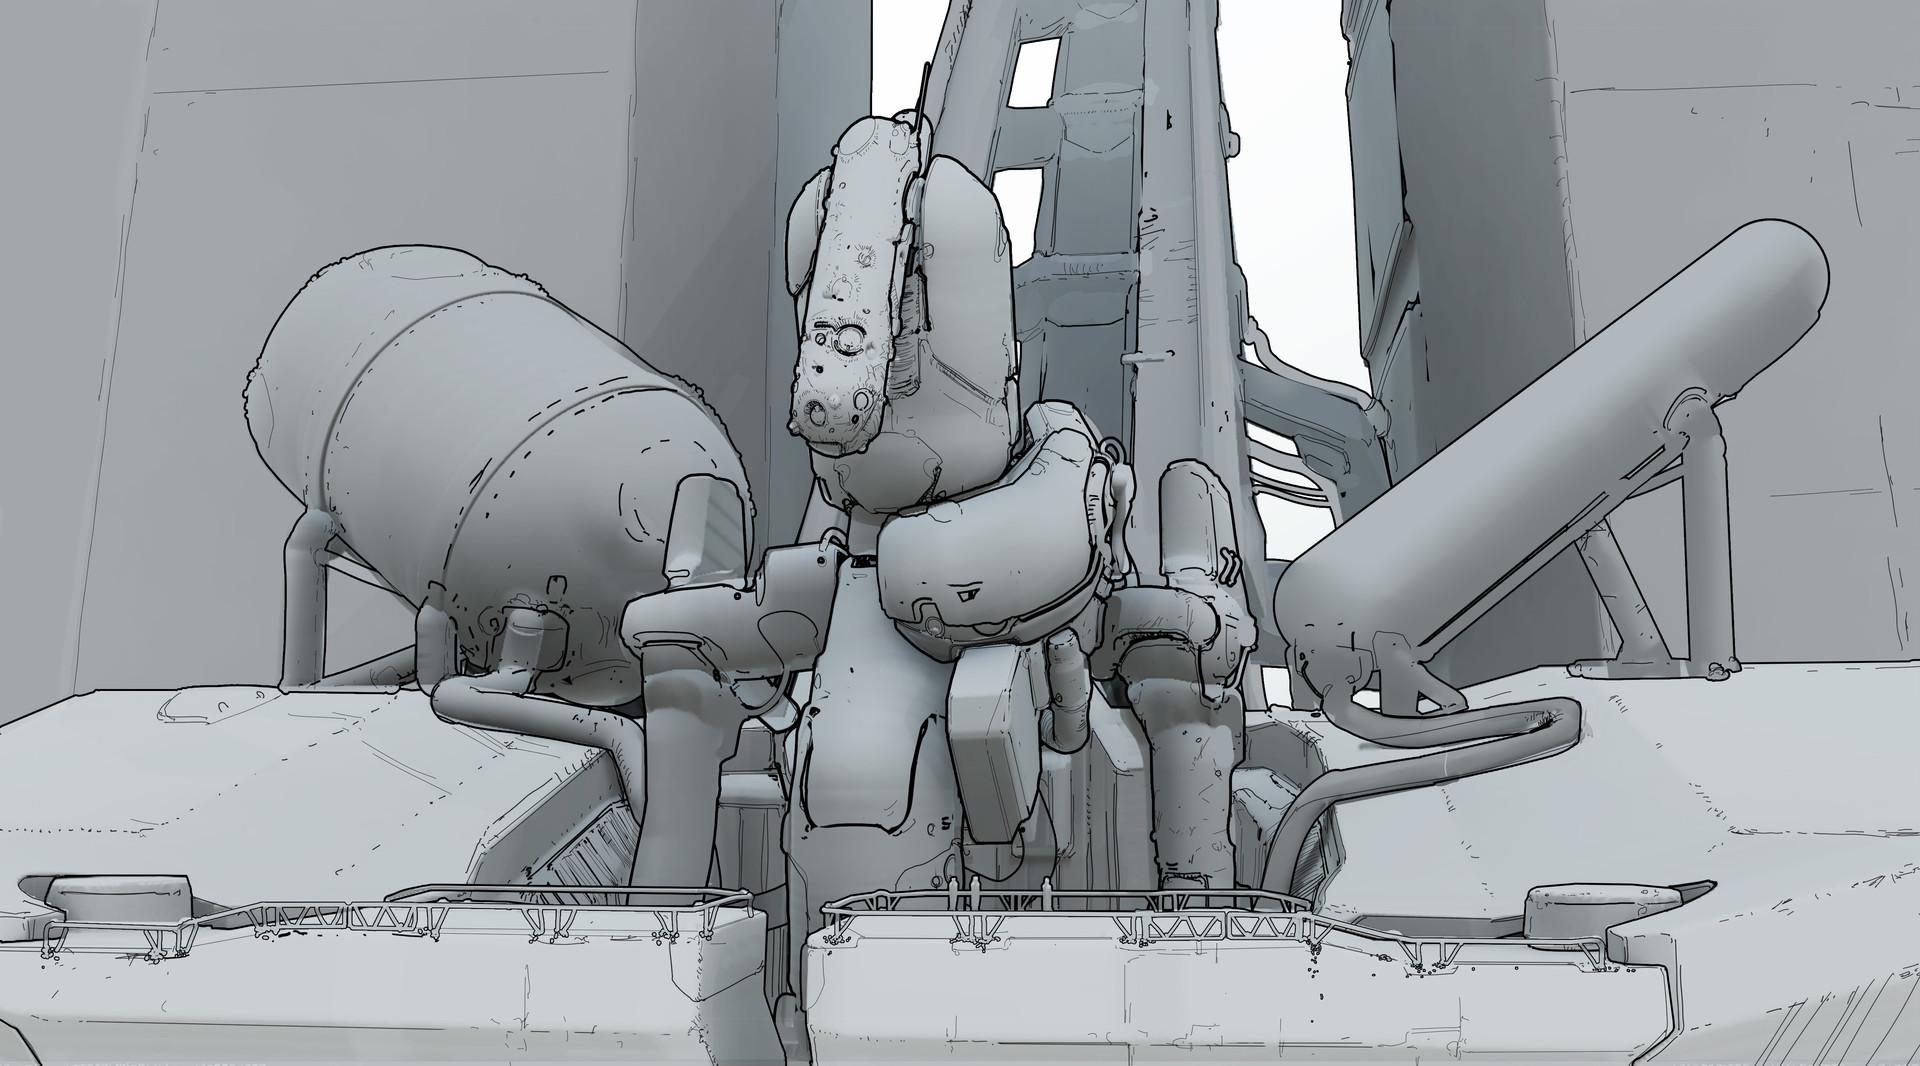 Mikhail rakhmatullin giant bot 2 4 1